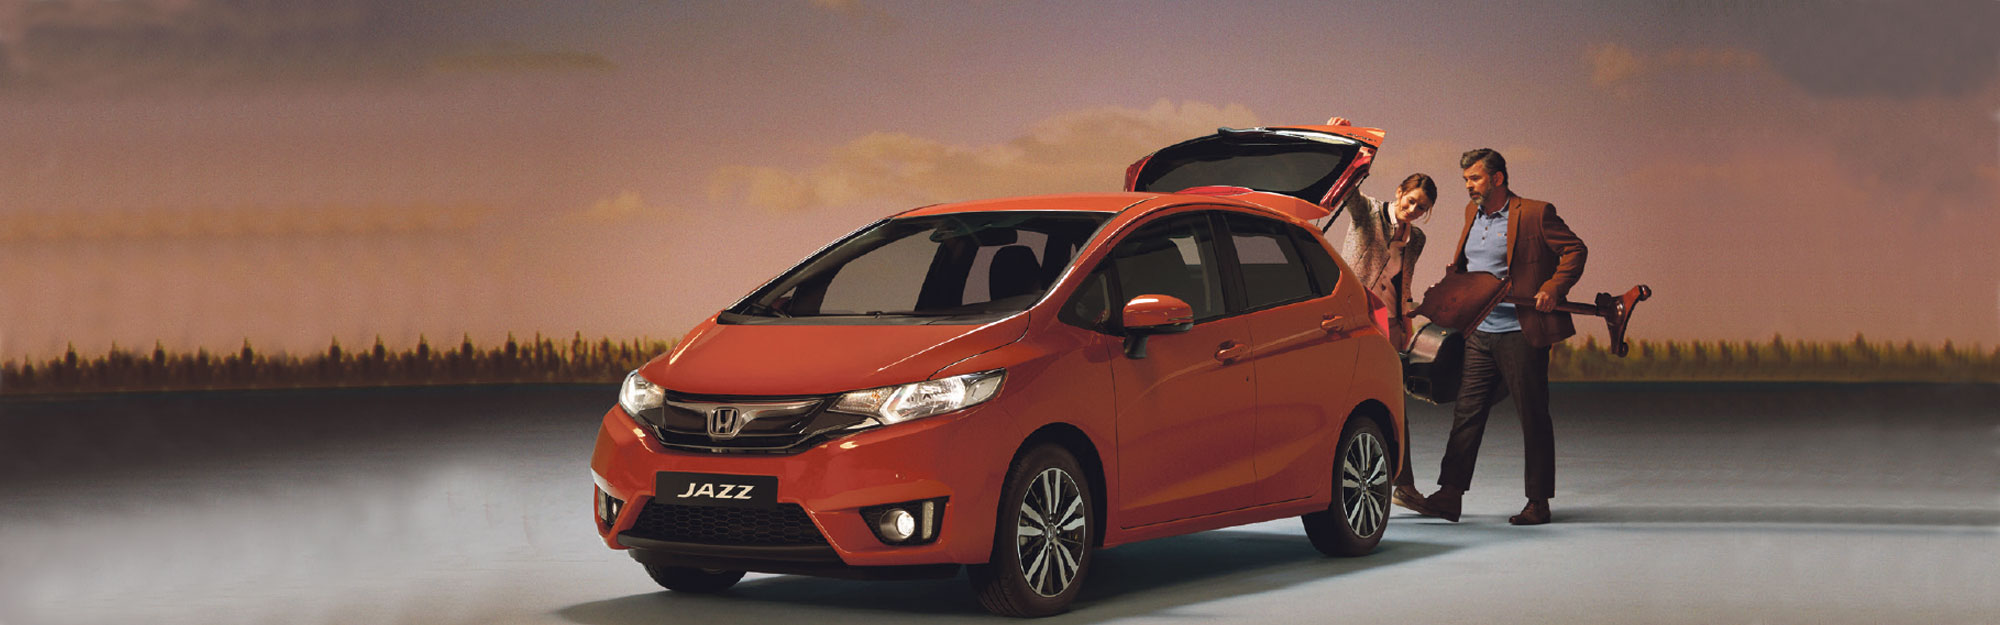 GARAGE-Vabis-Honda-Jazz-2000x625